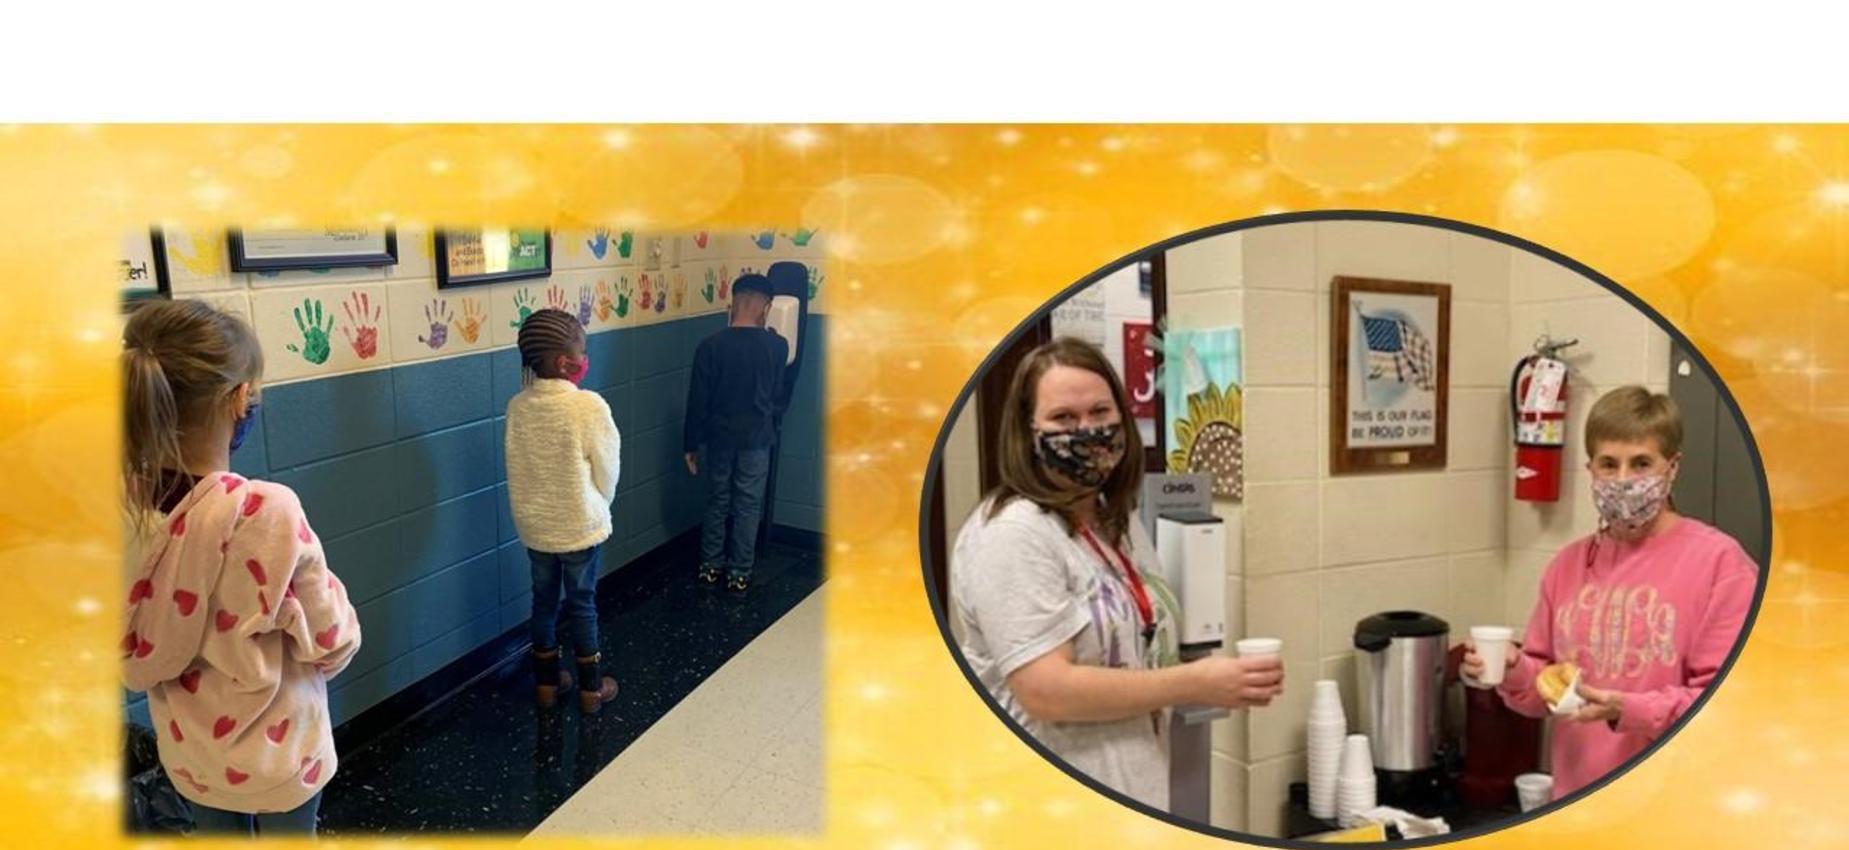 Germ-x station and teachers enjoying whimsical Wednesday.